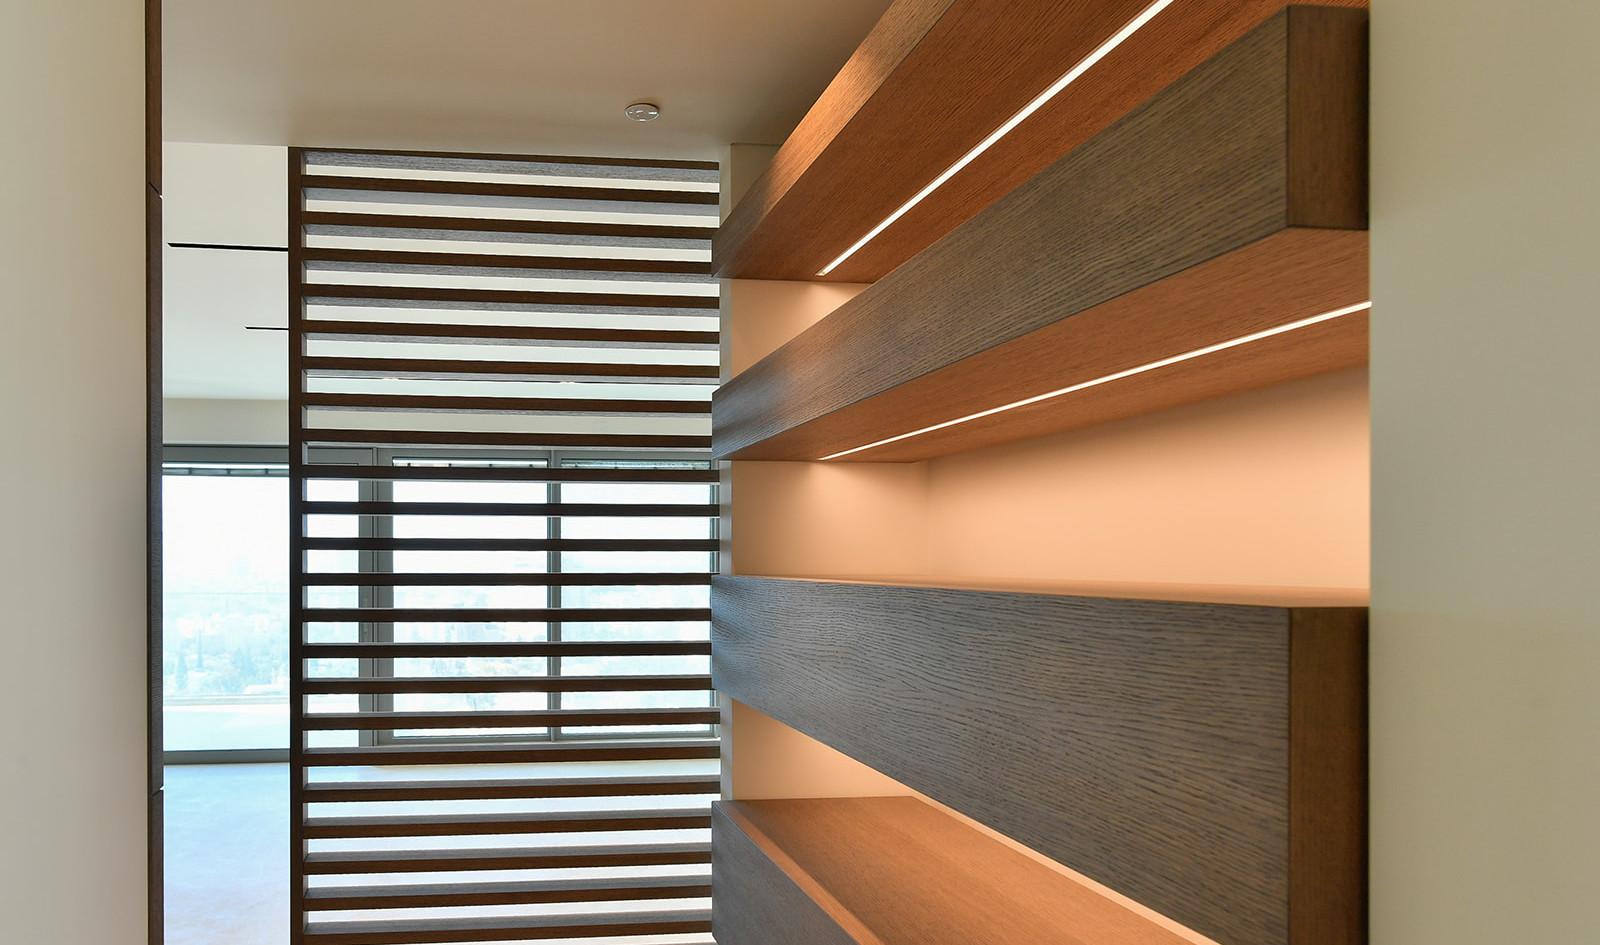 Park tsameret, shelves